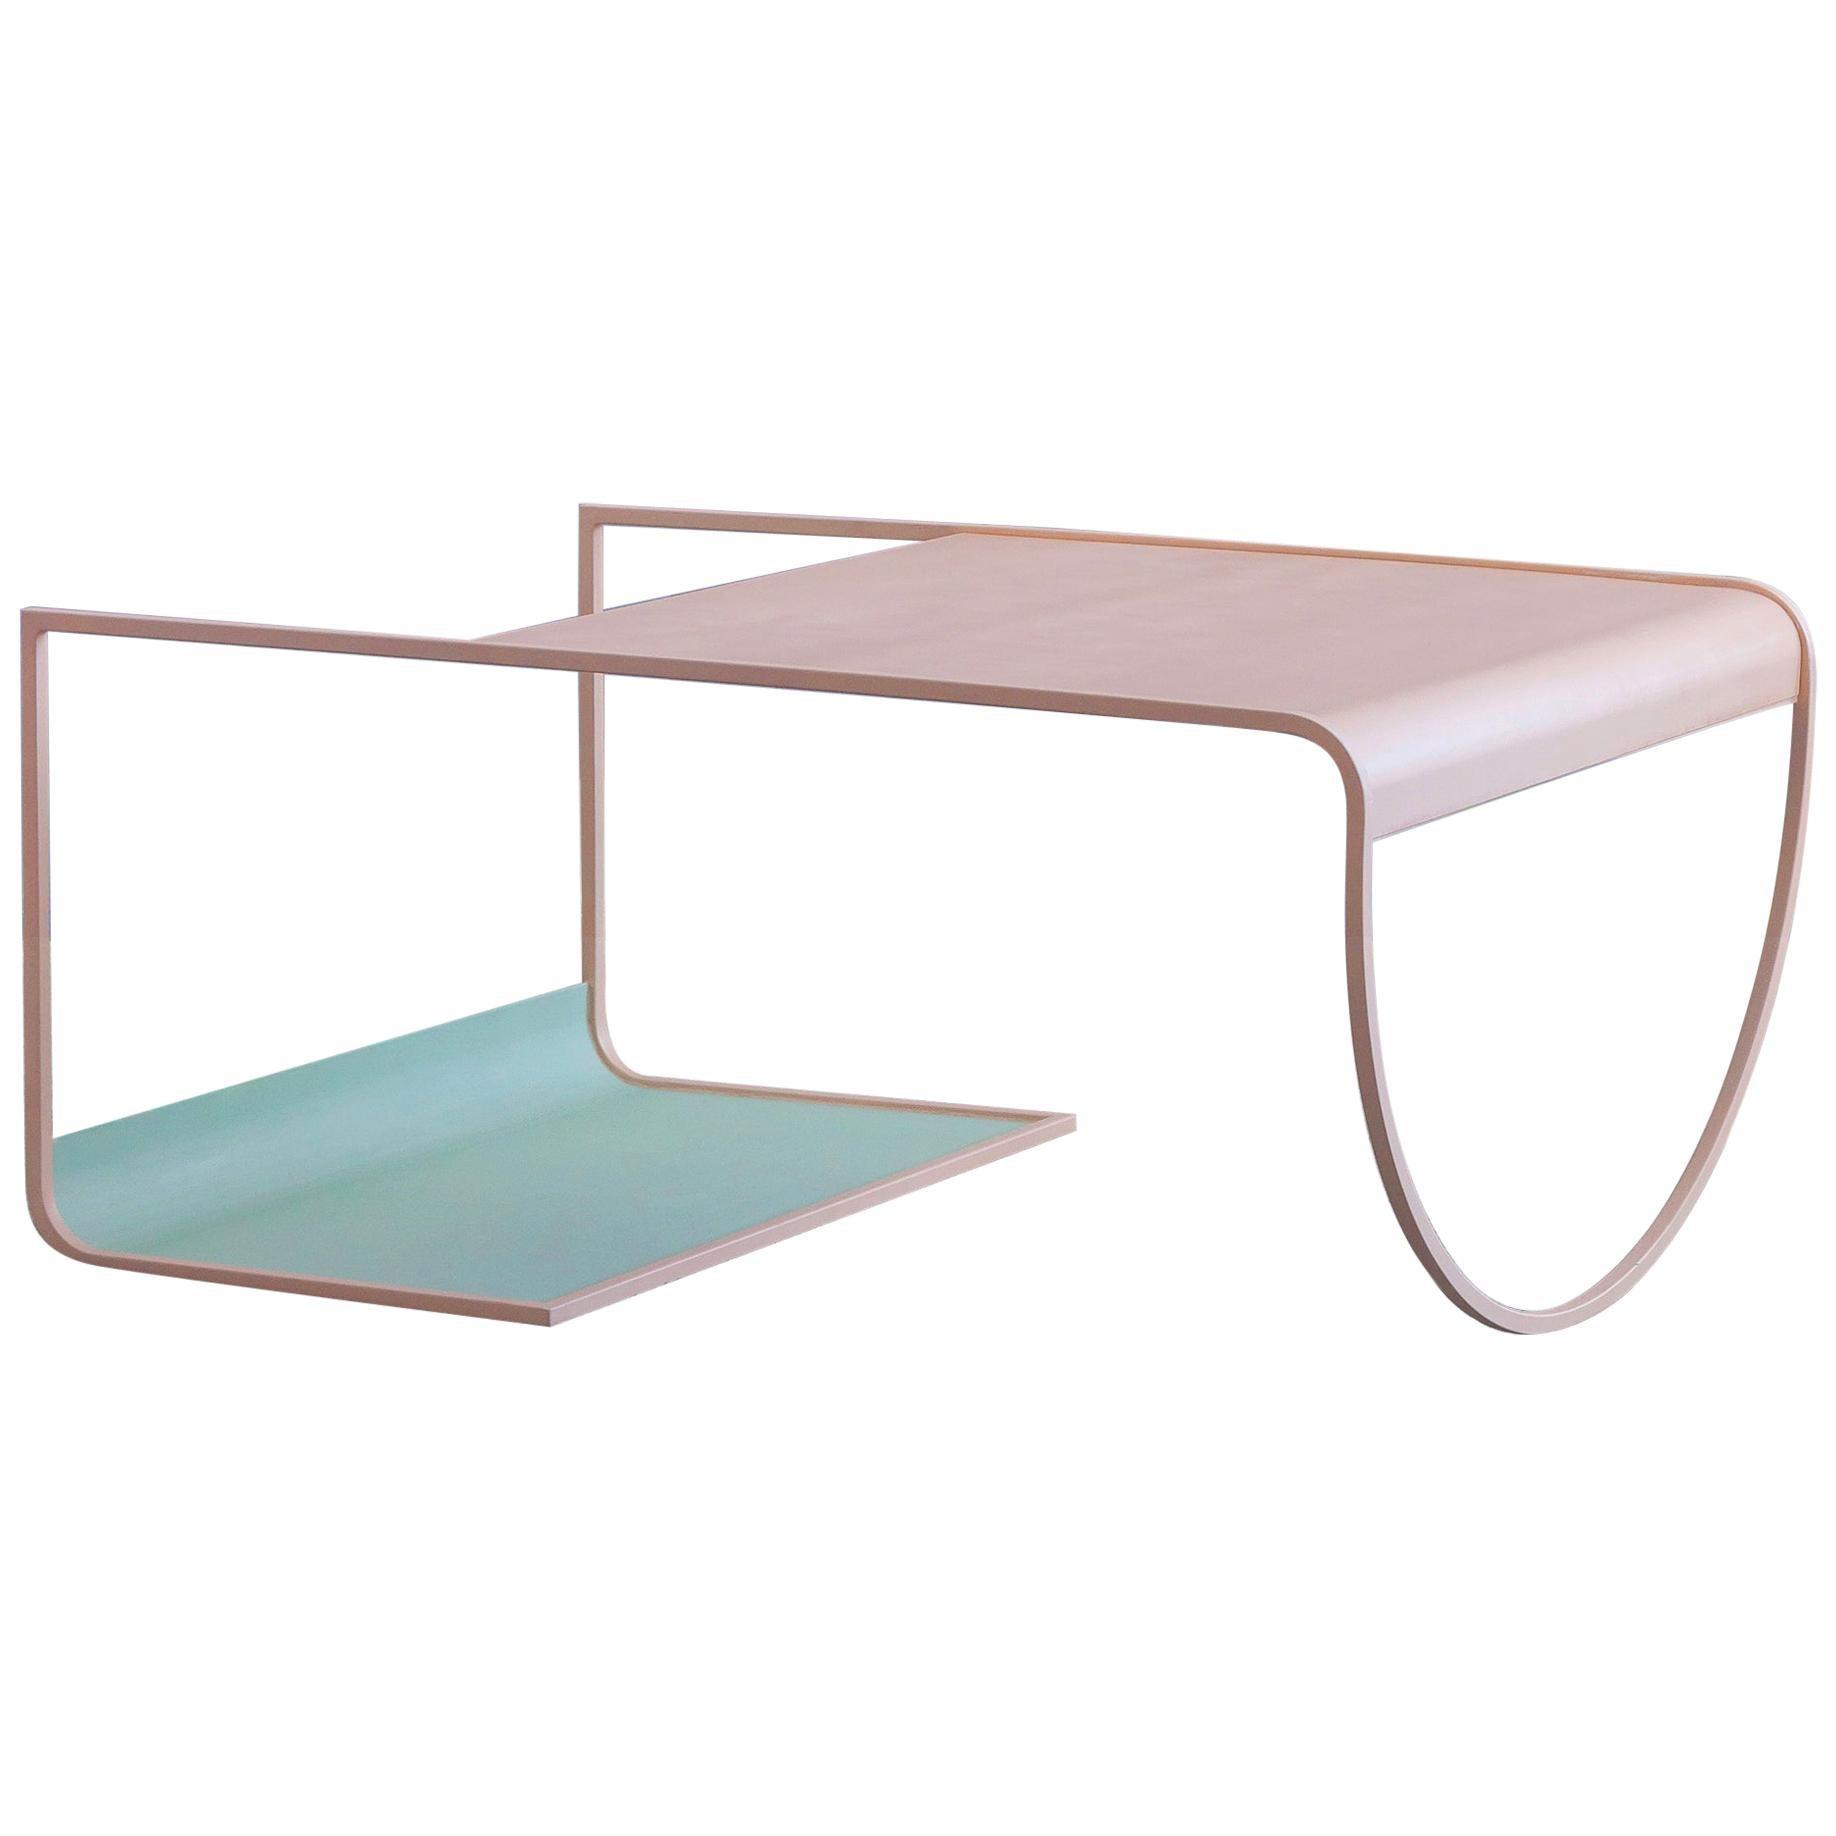 Steel SW Coffee Table by Soft-geometry